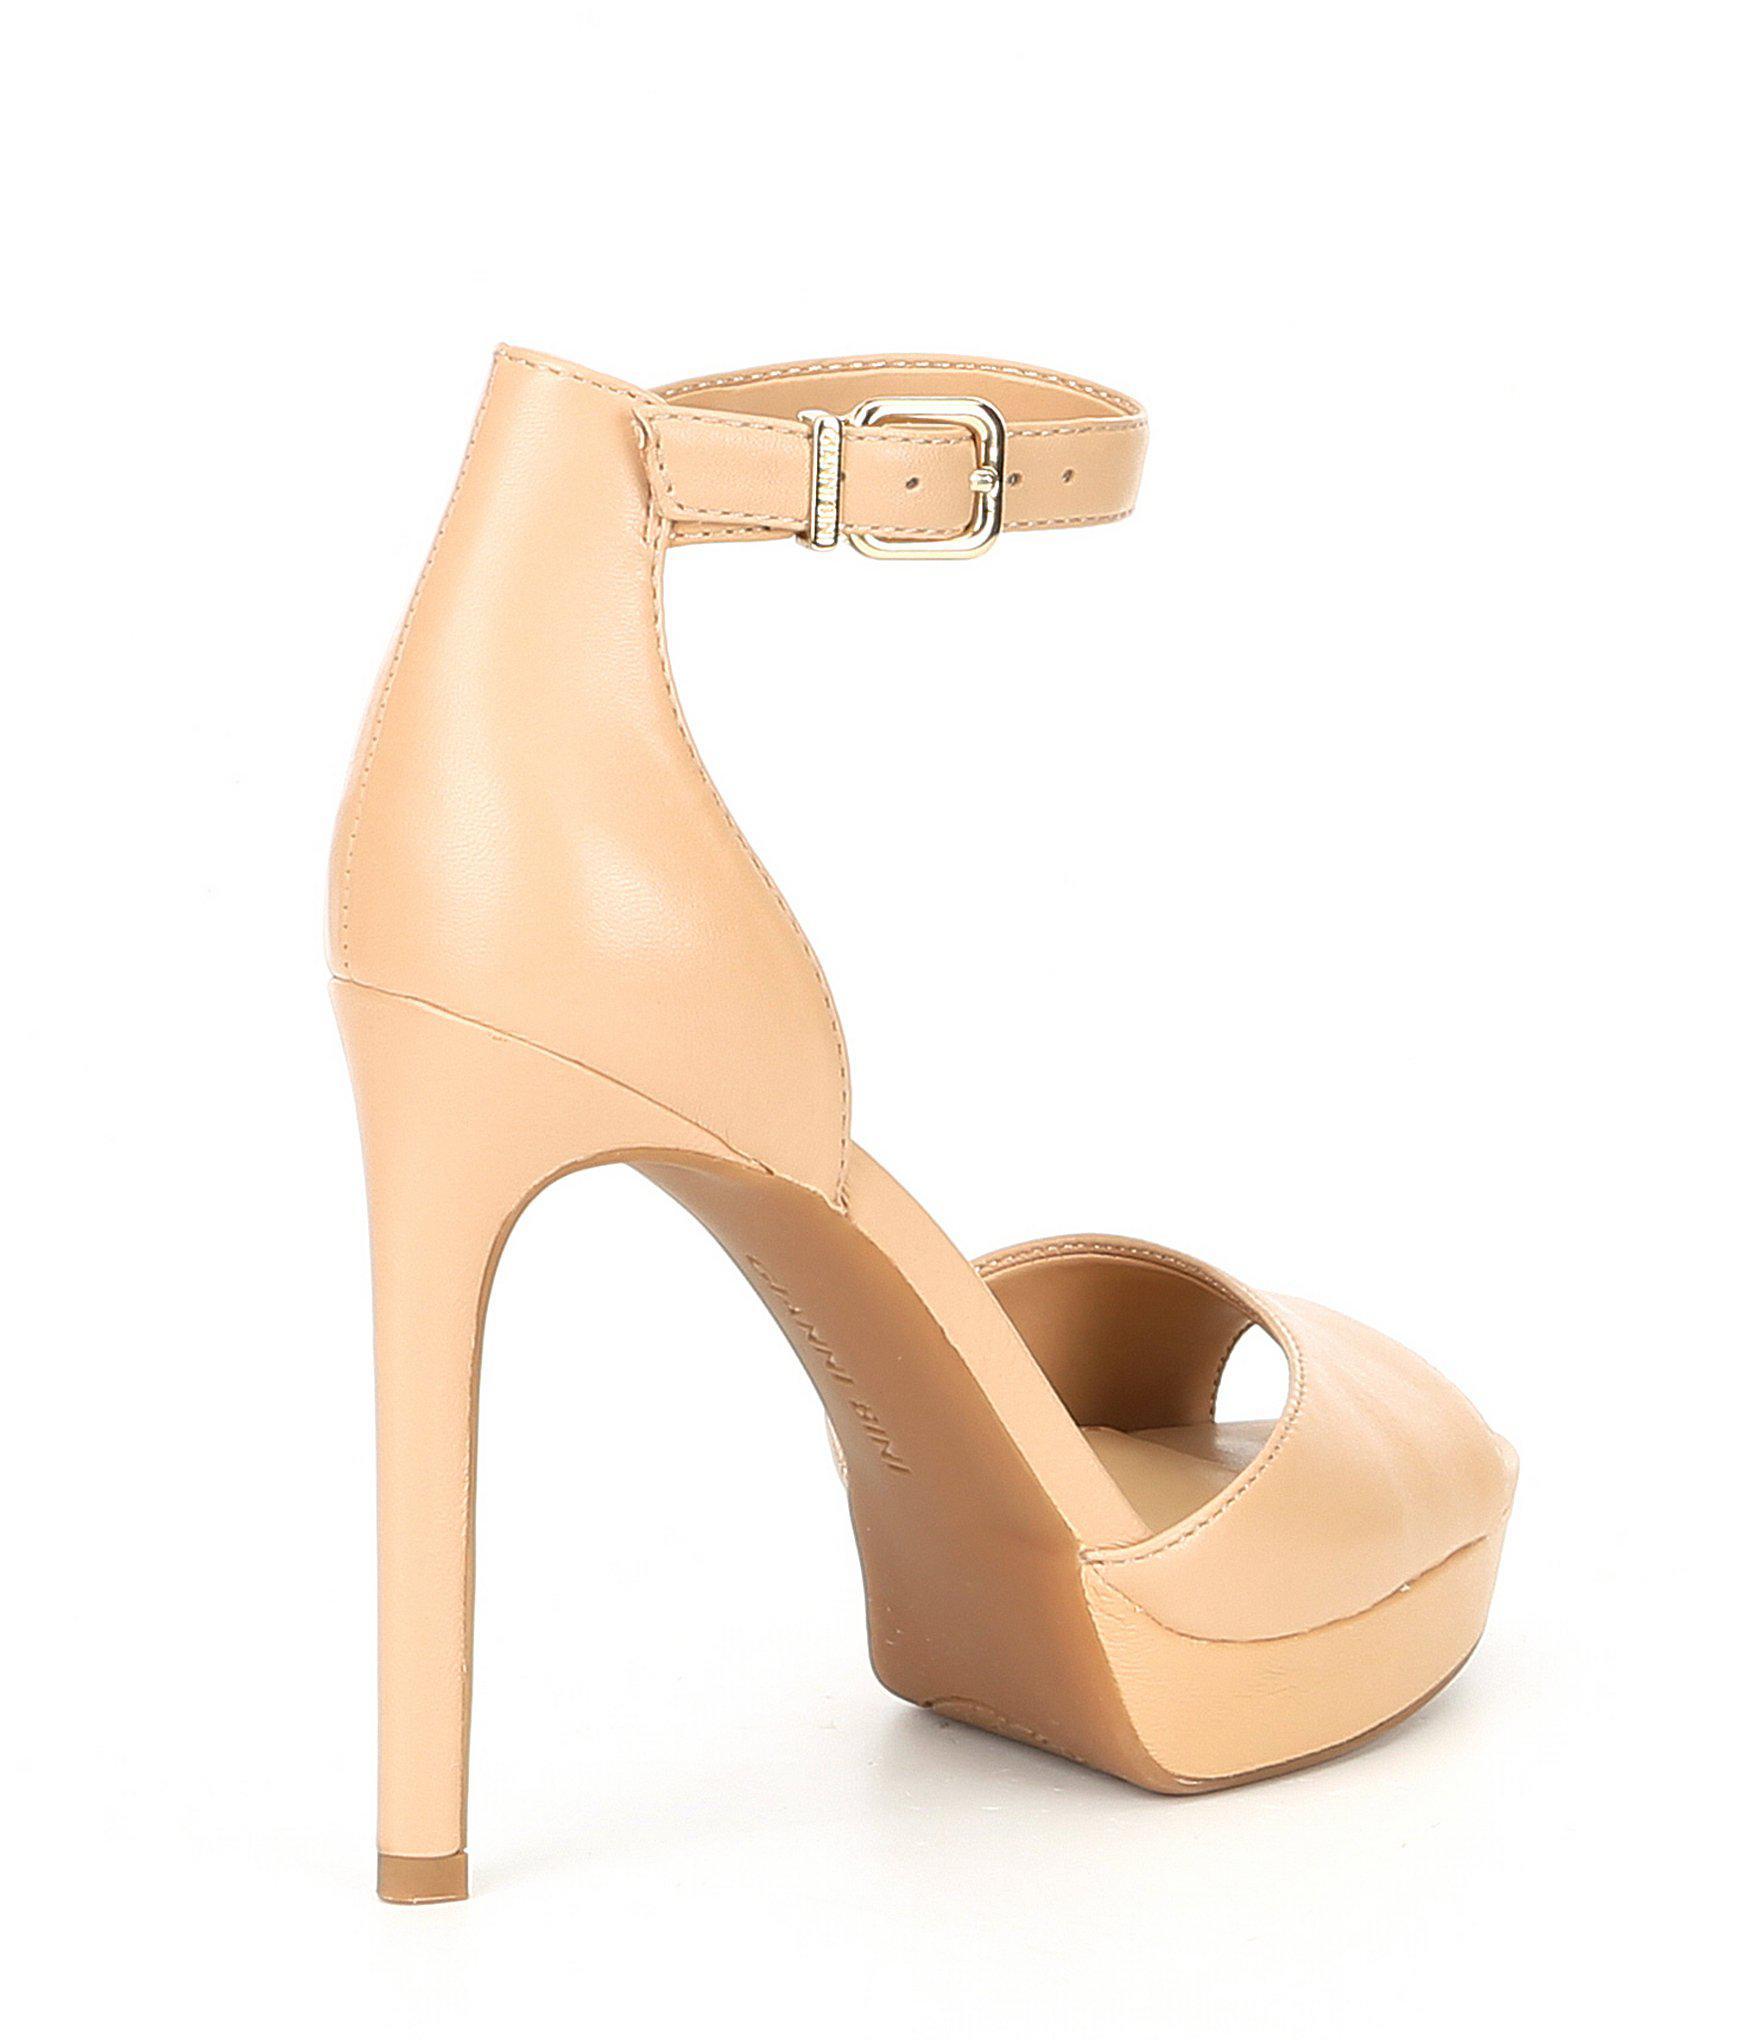 e9d25612d Gianni Bini Austinne Platform Dress Sandals in Natural - Lyst